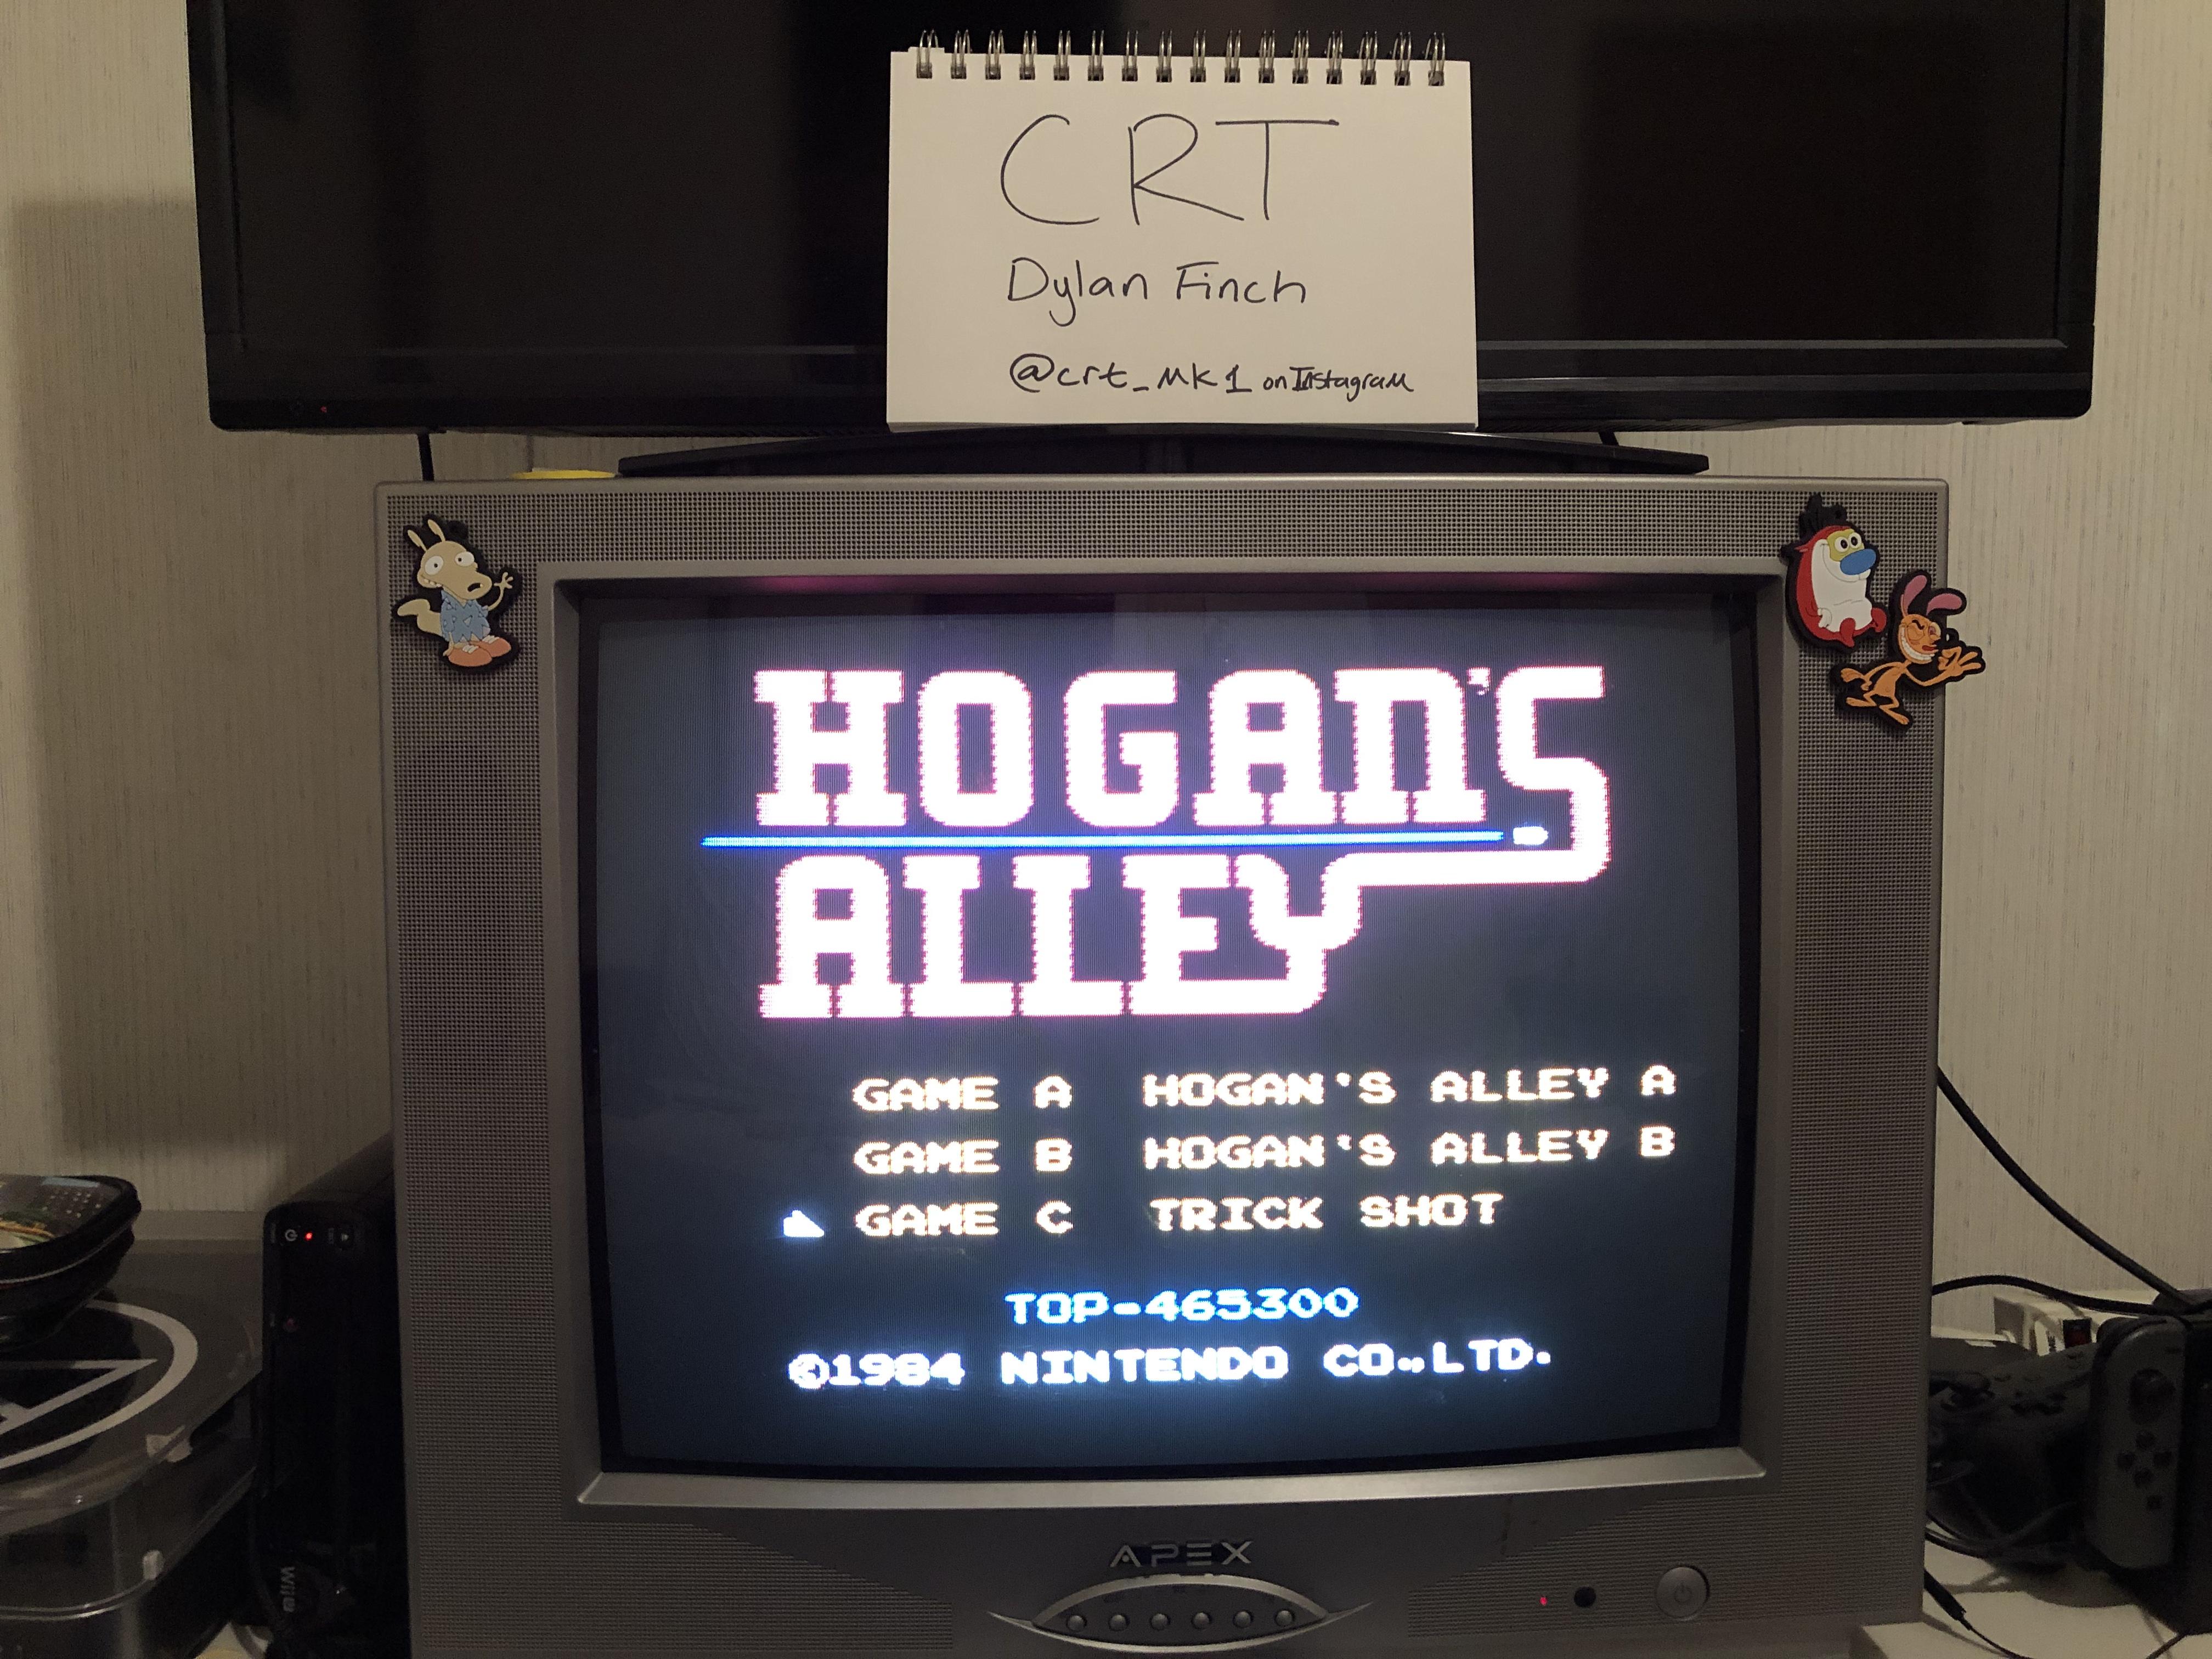 CRT: Hogan